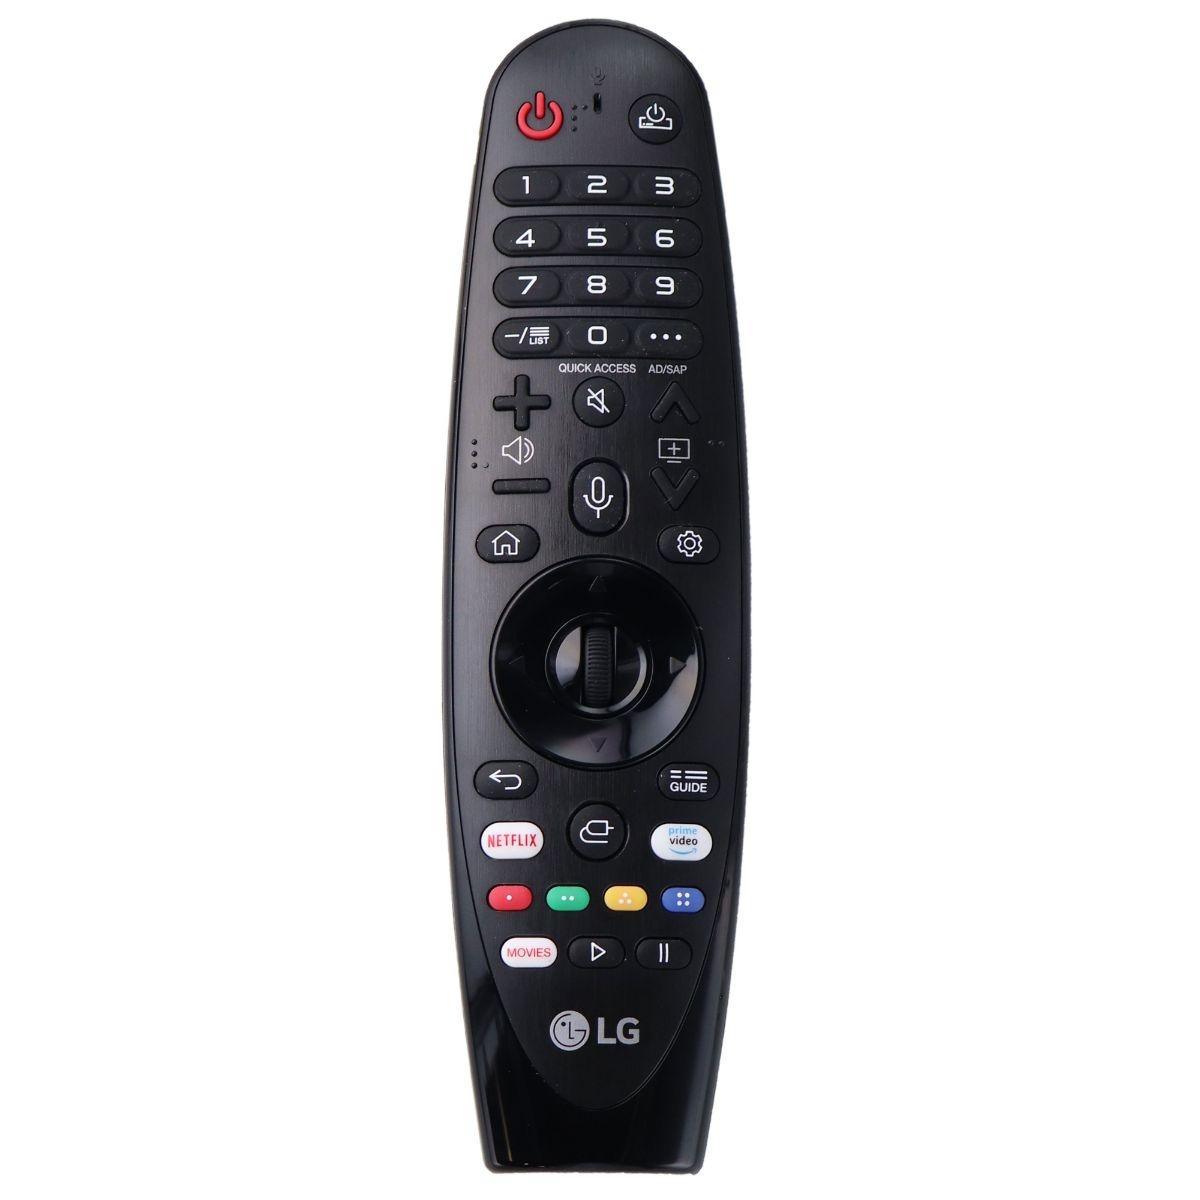 LG Magic Remote Control for LG TVs - Black (AN-MR198A)